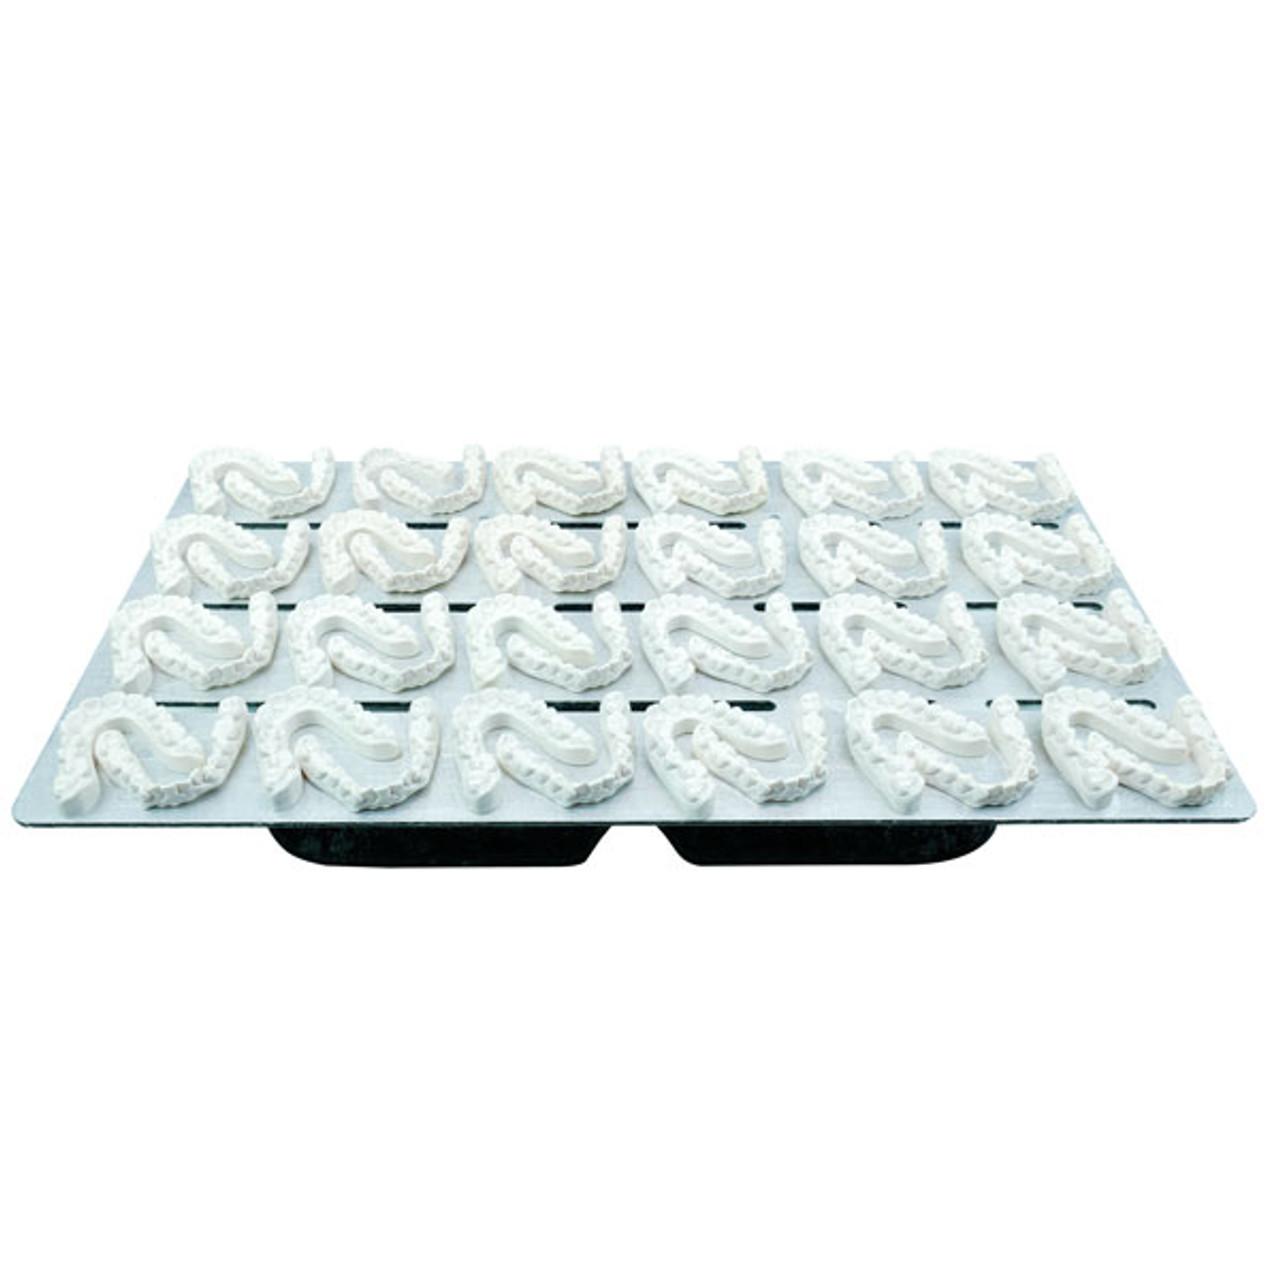 LC Dental Platform with flexplate